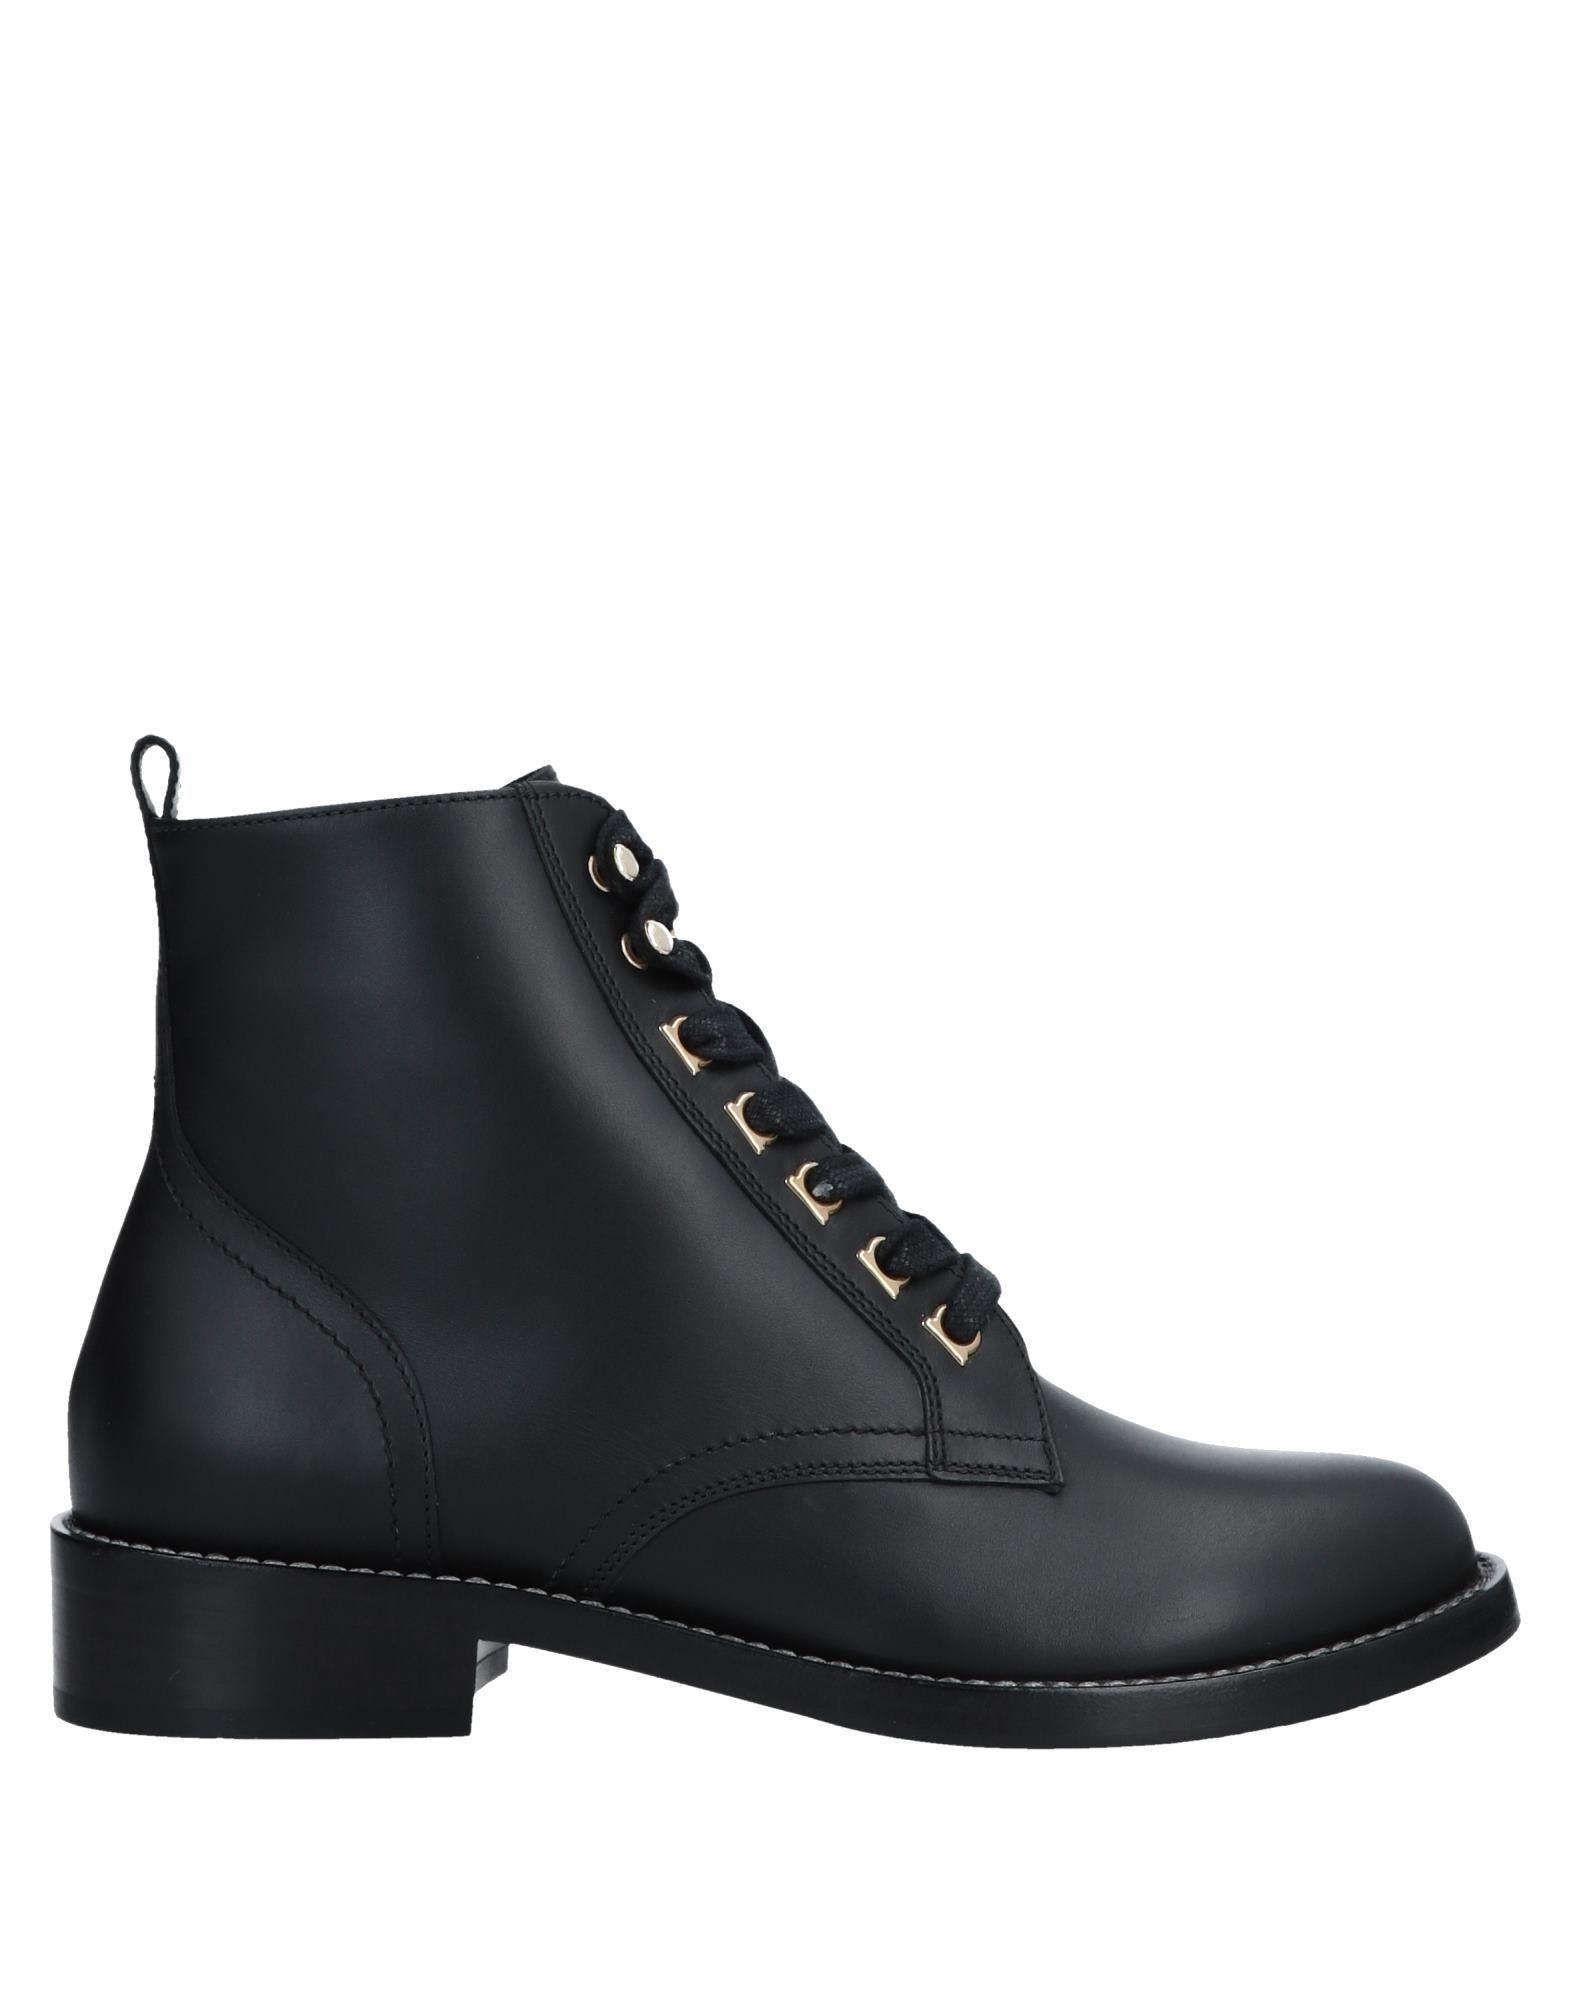 SALVATORE FERRAGAMO Полусапоги и высокие ботинки демисезонные ботинки ferragamo parigi calf hazelnut